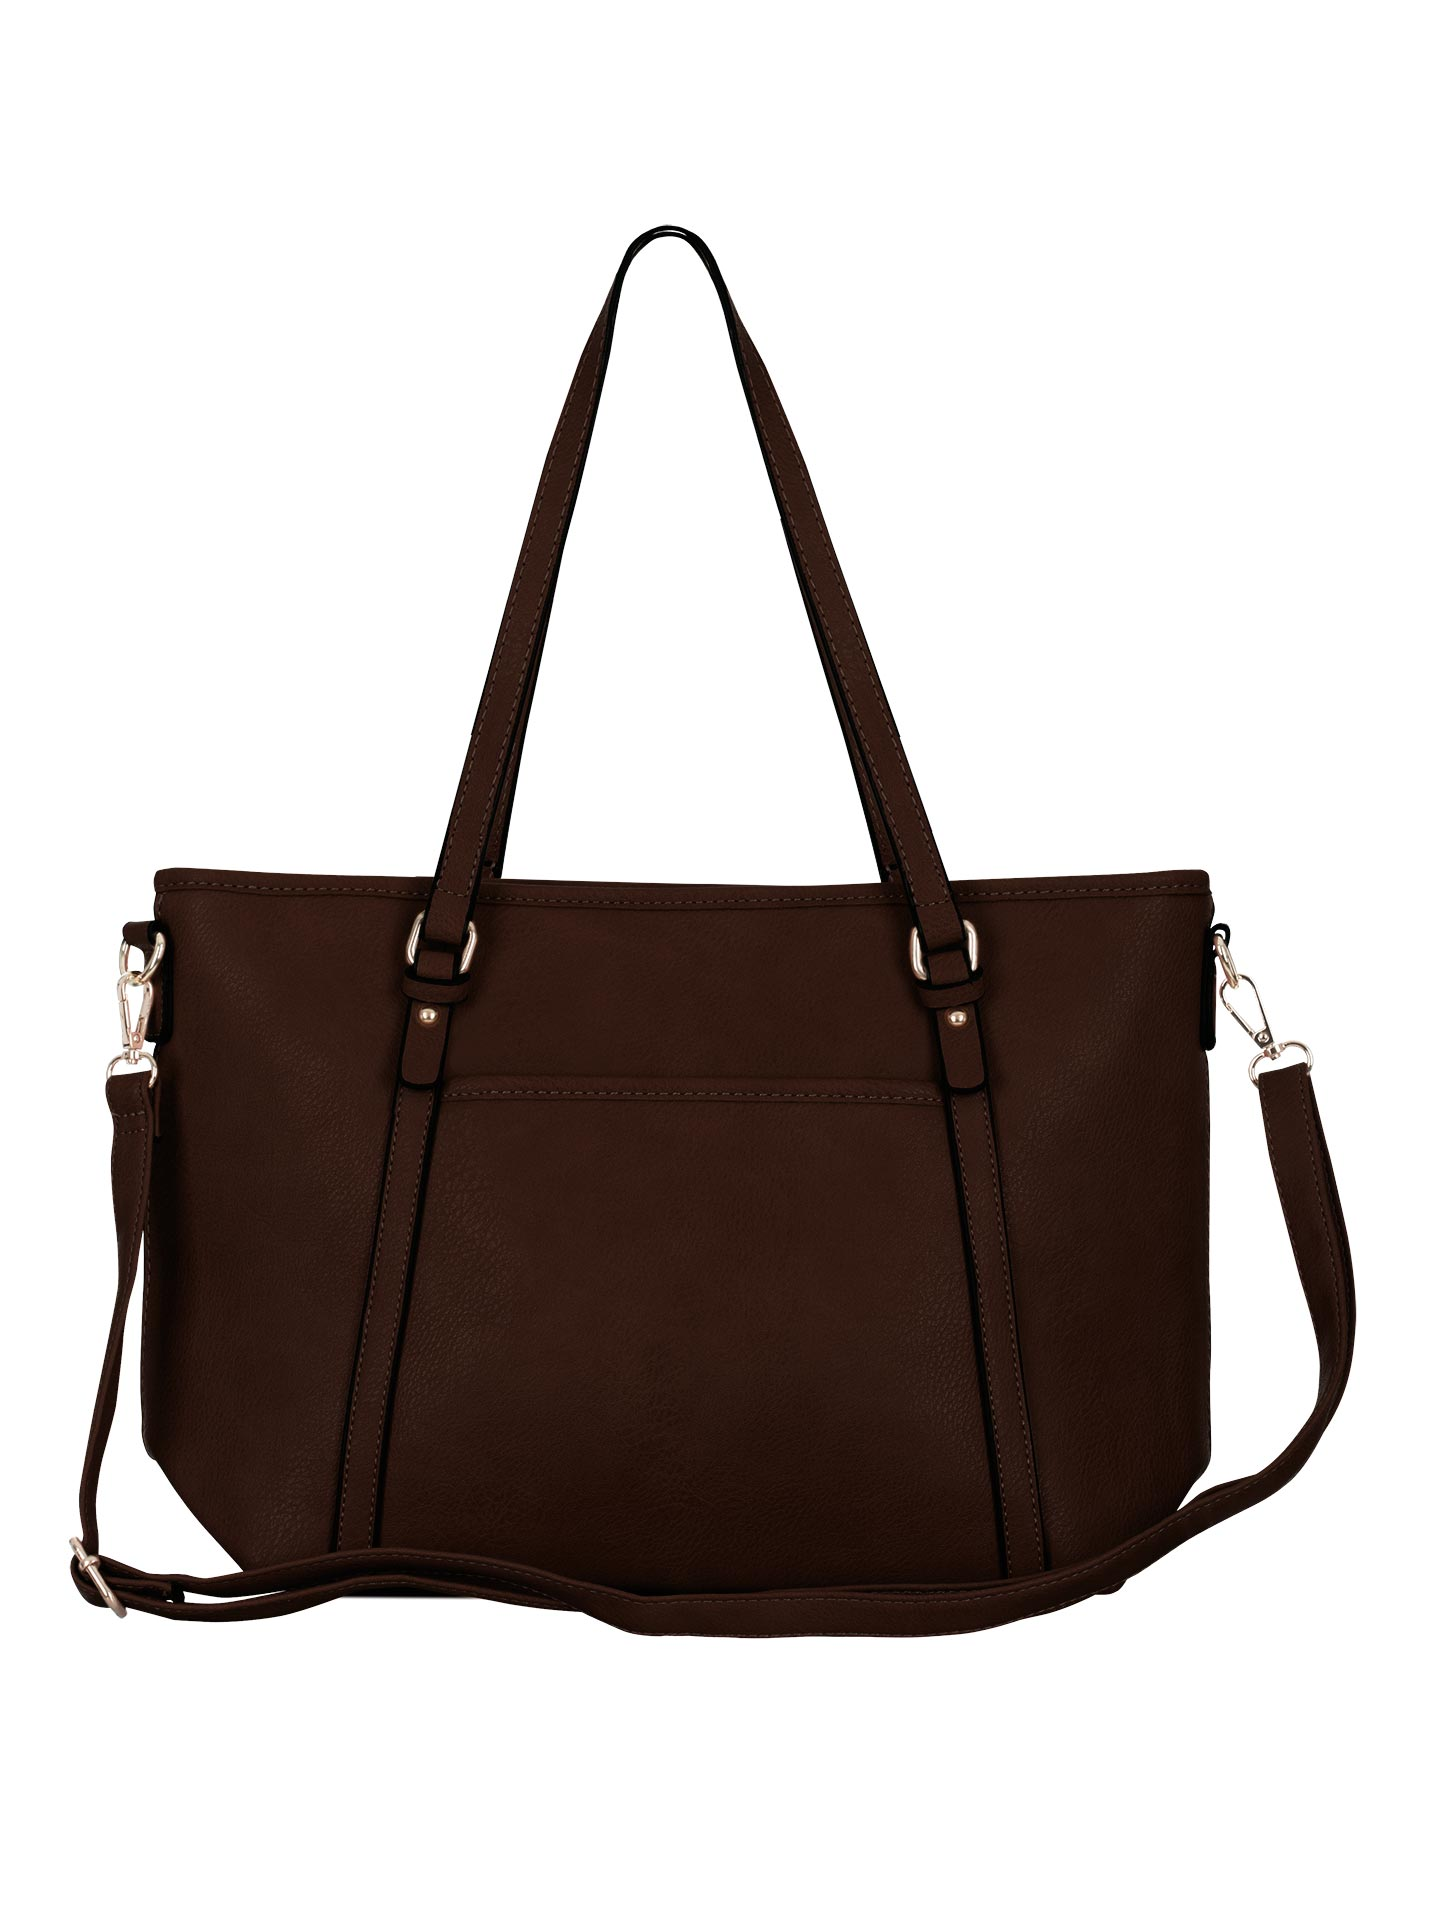 4ba635cd2d Τσάντα ώμου με τσέπη σε καφε σκουρο